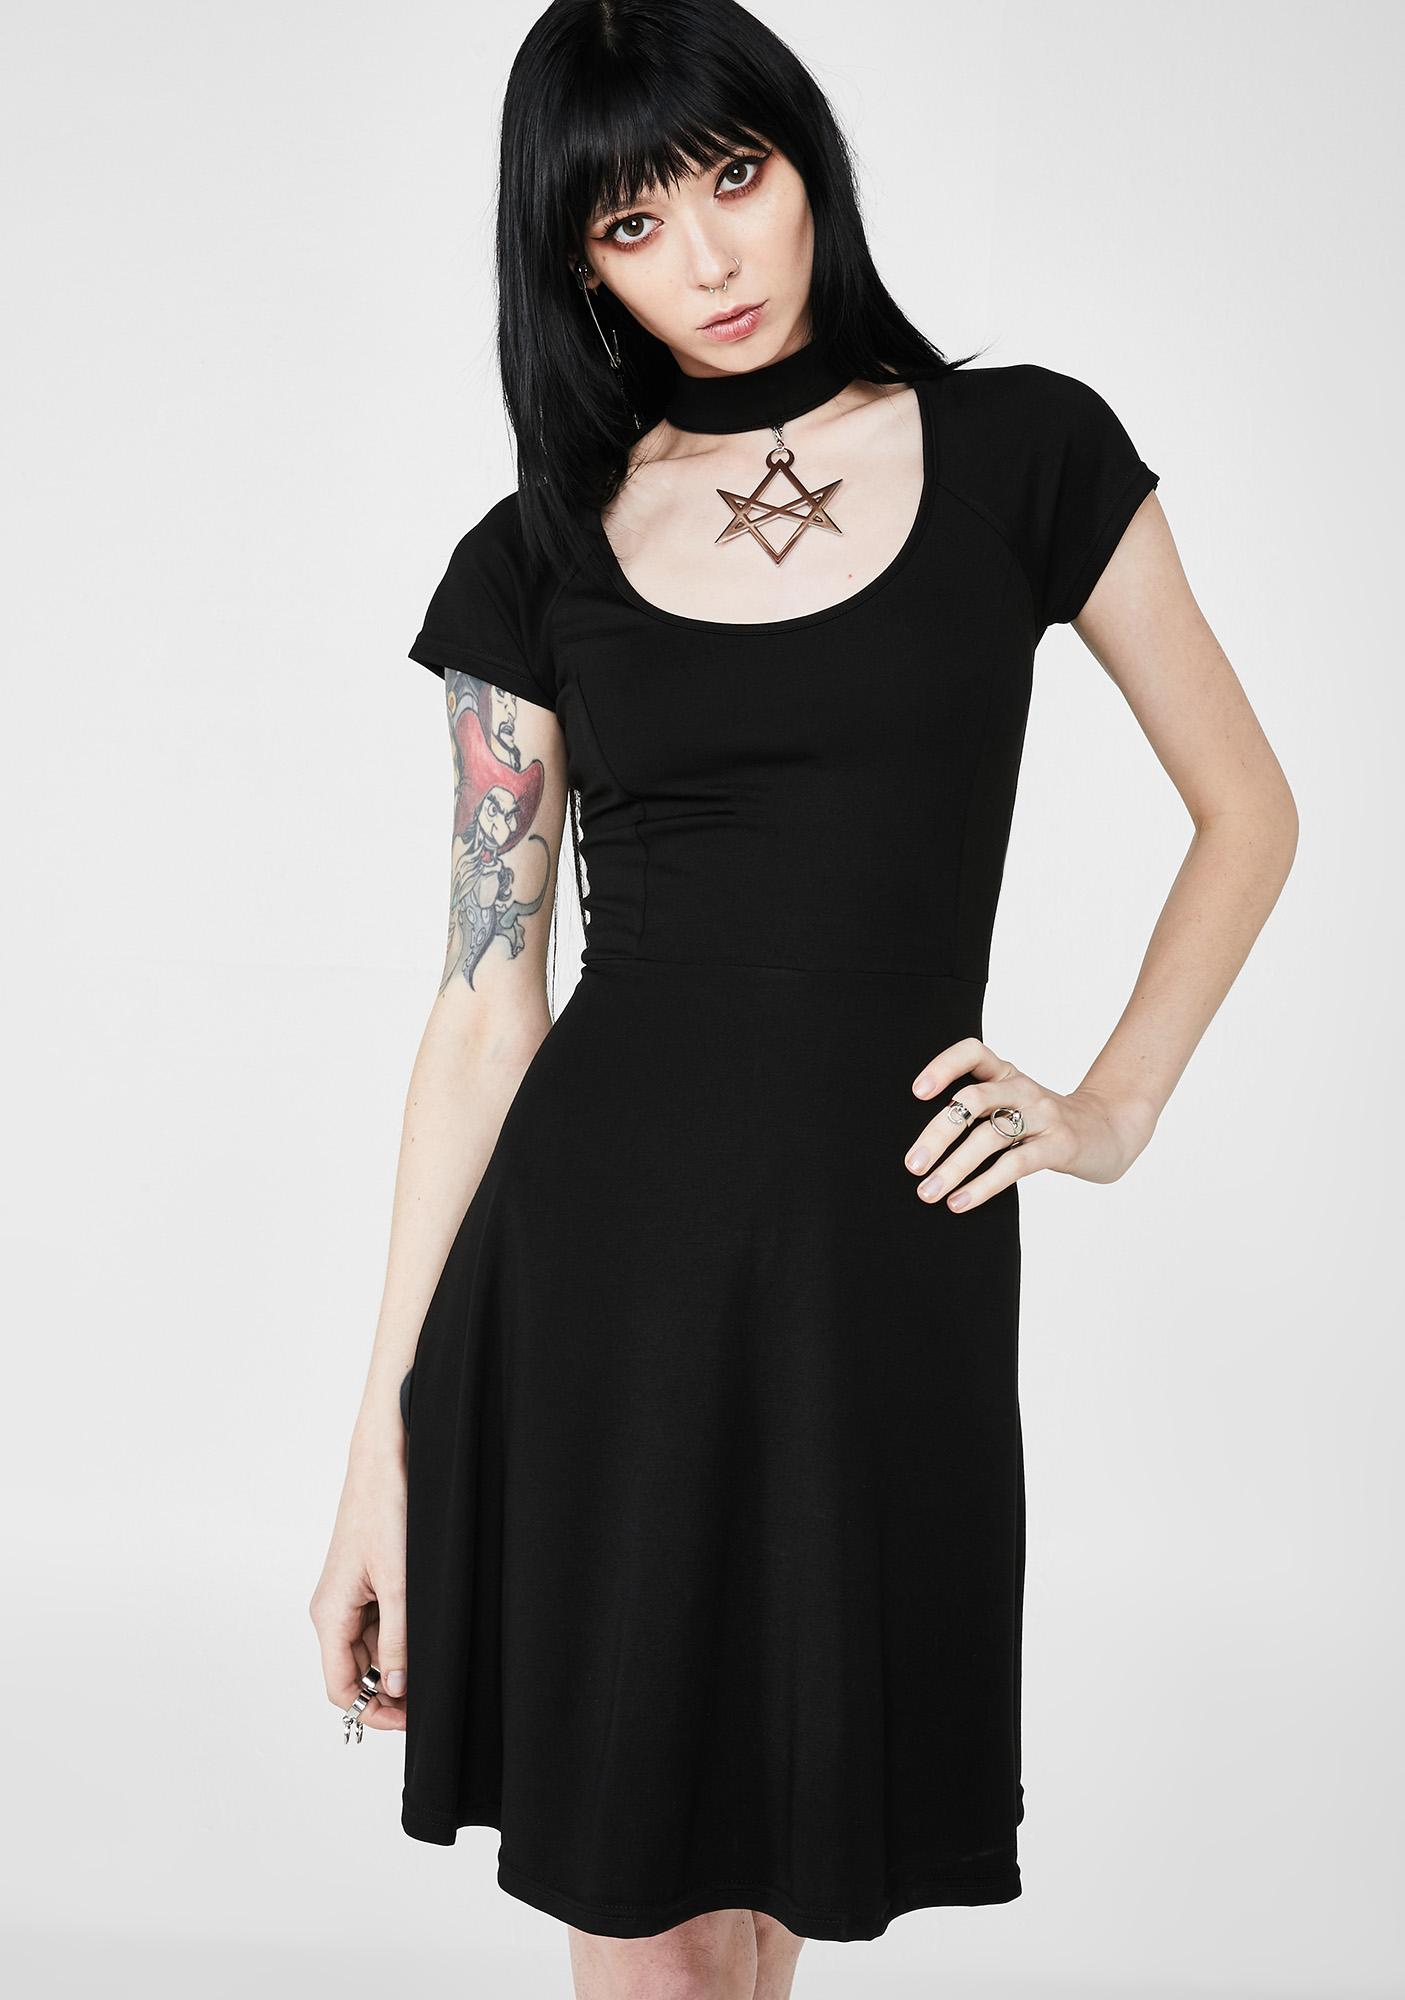 Killstar Sacred Sixx Skater Dress